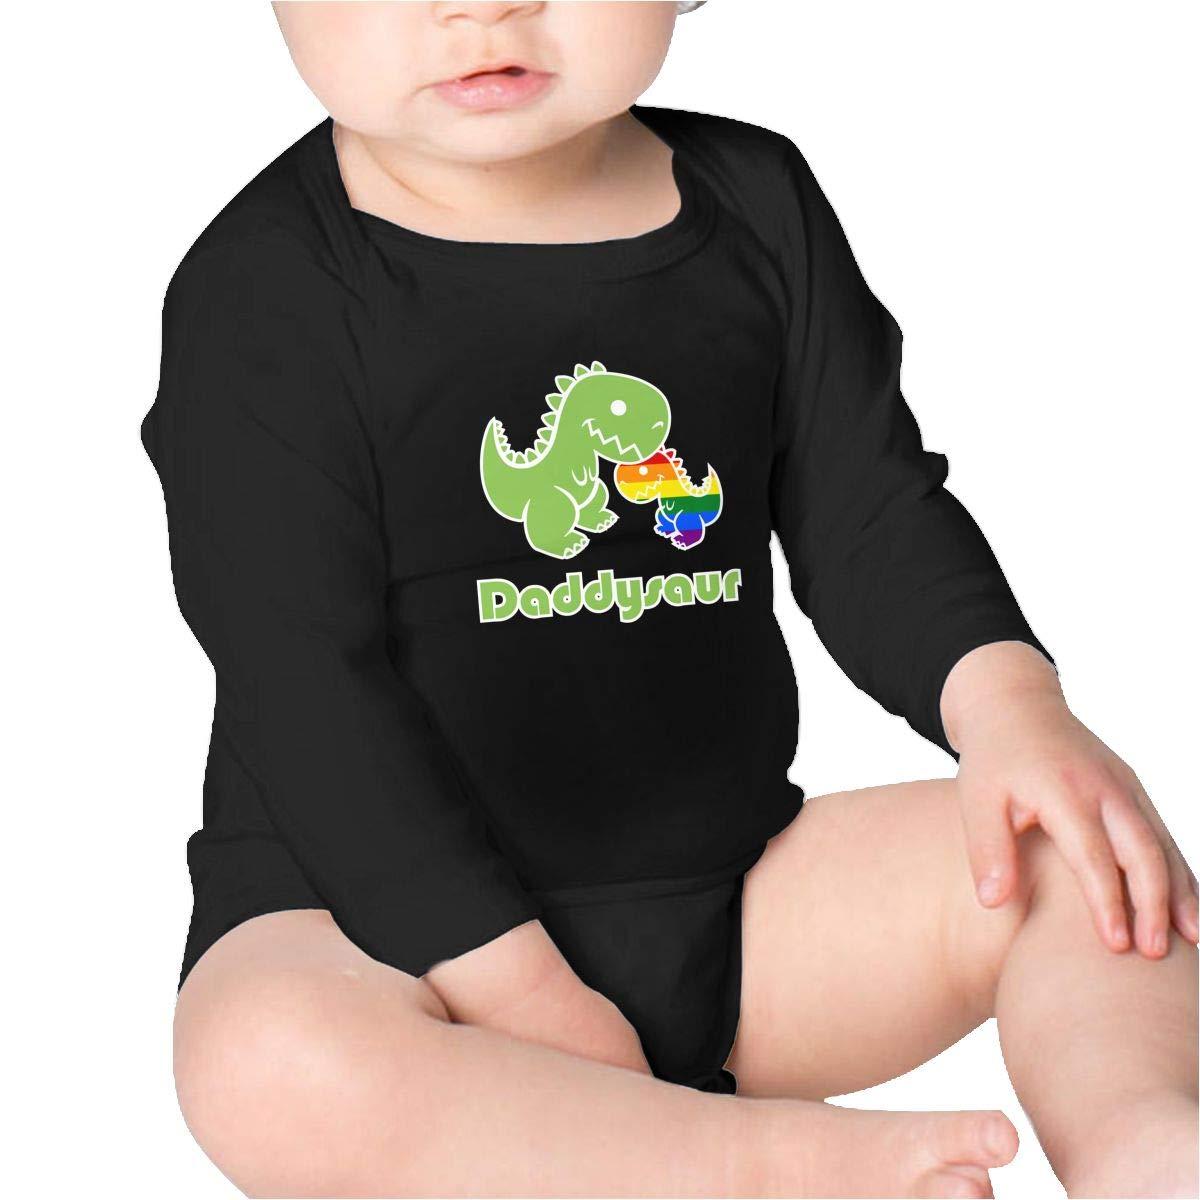 Pikaqiuleilei Daddysaur Dinosaur LGBT Kids Cotton,Long Sleeve Infantile Suit